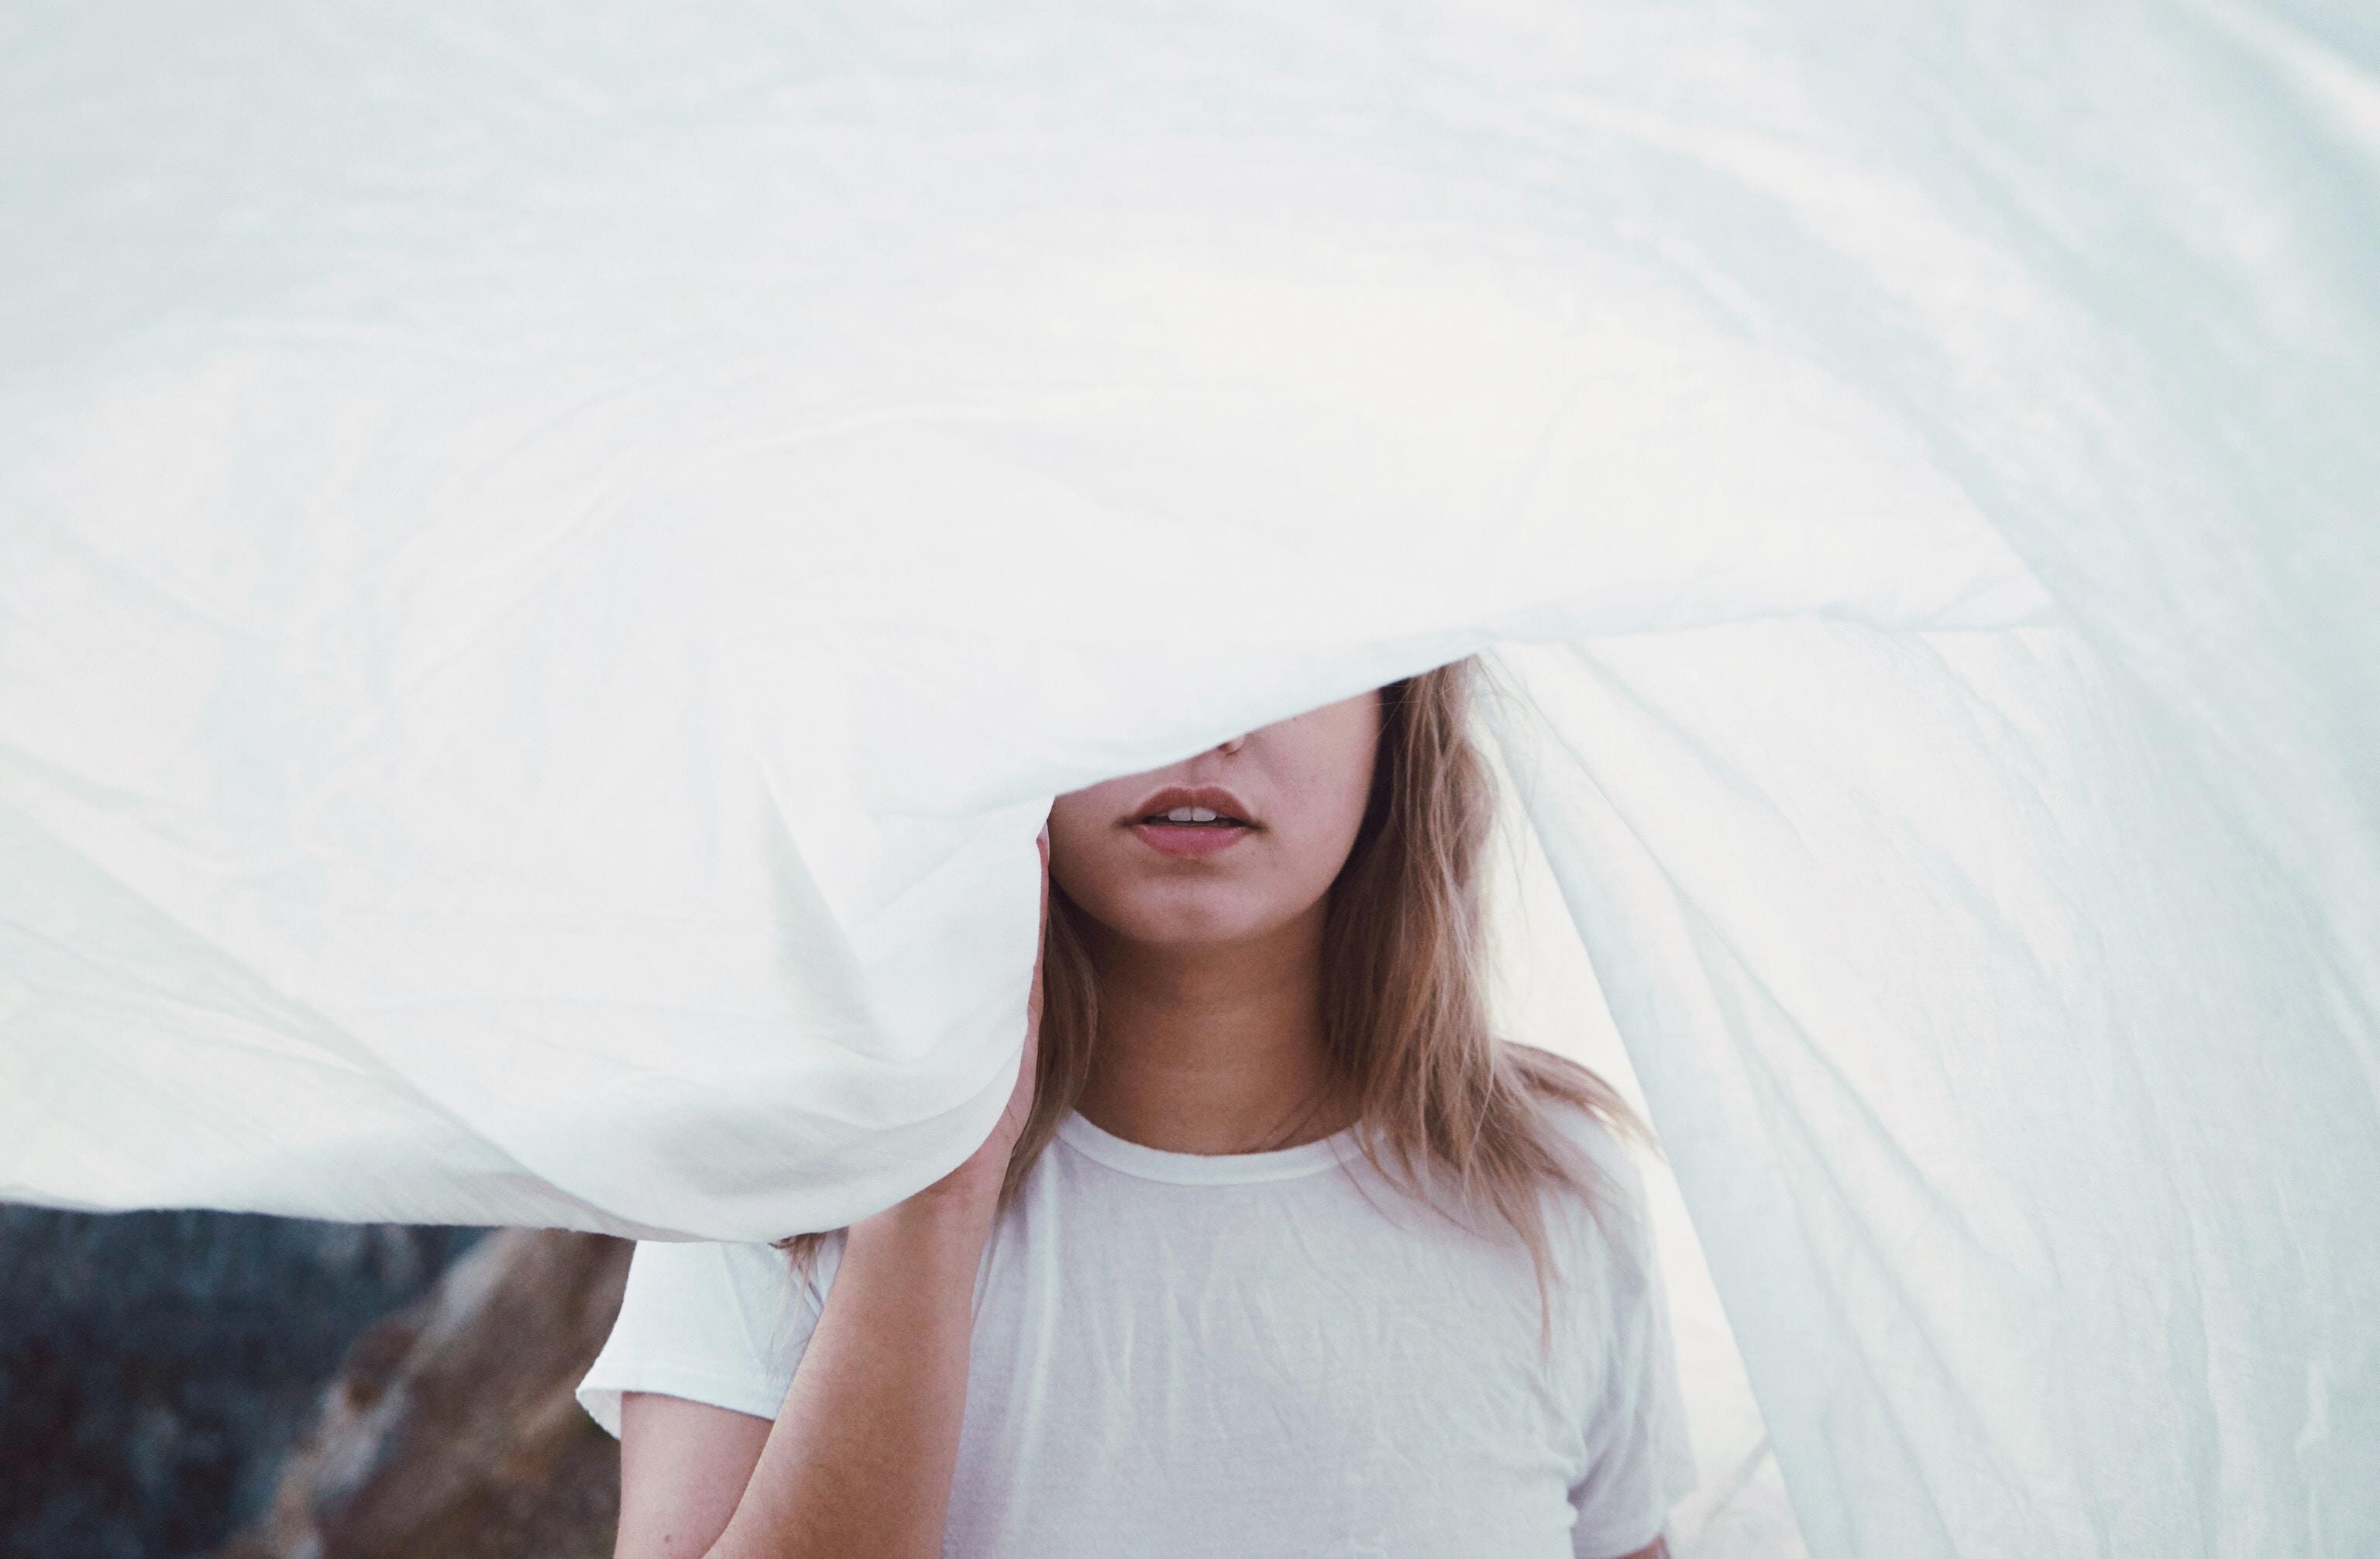 woman under white cloth